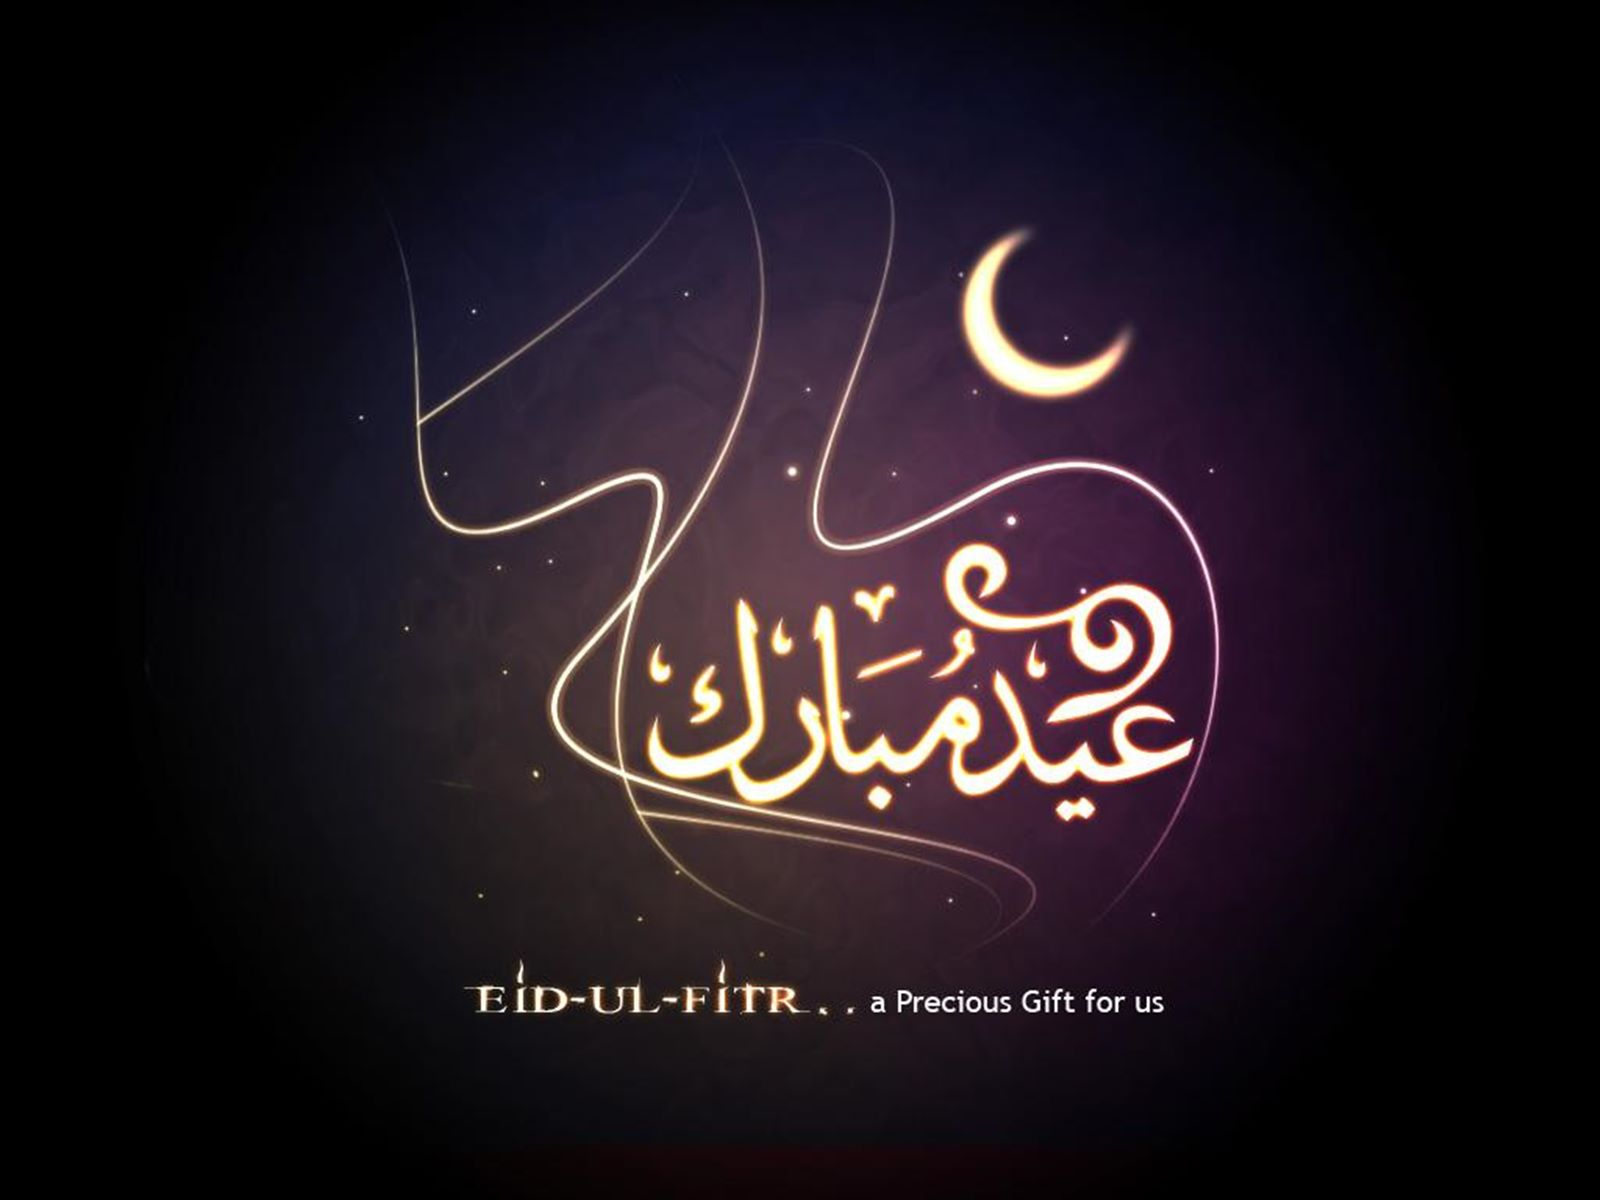 Love Eid Mubarak Wallpaper : EID Mubarak Wallpapers 2015 - EID Greetings cards - XciteFun.net